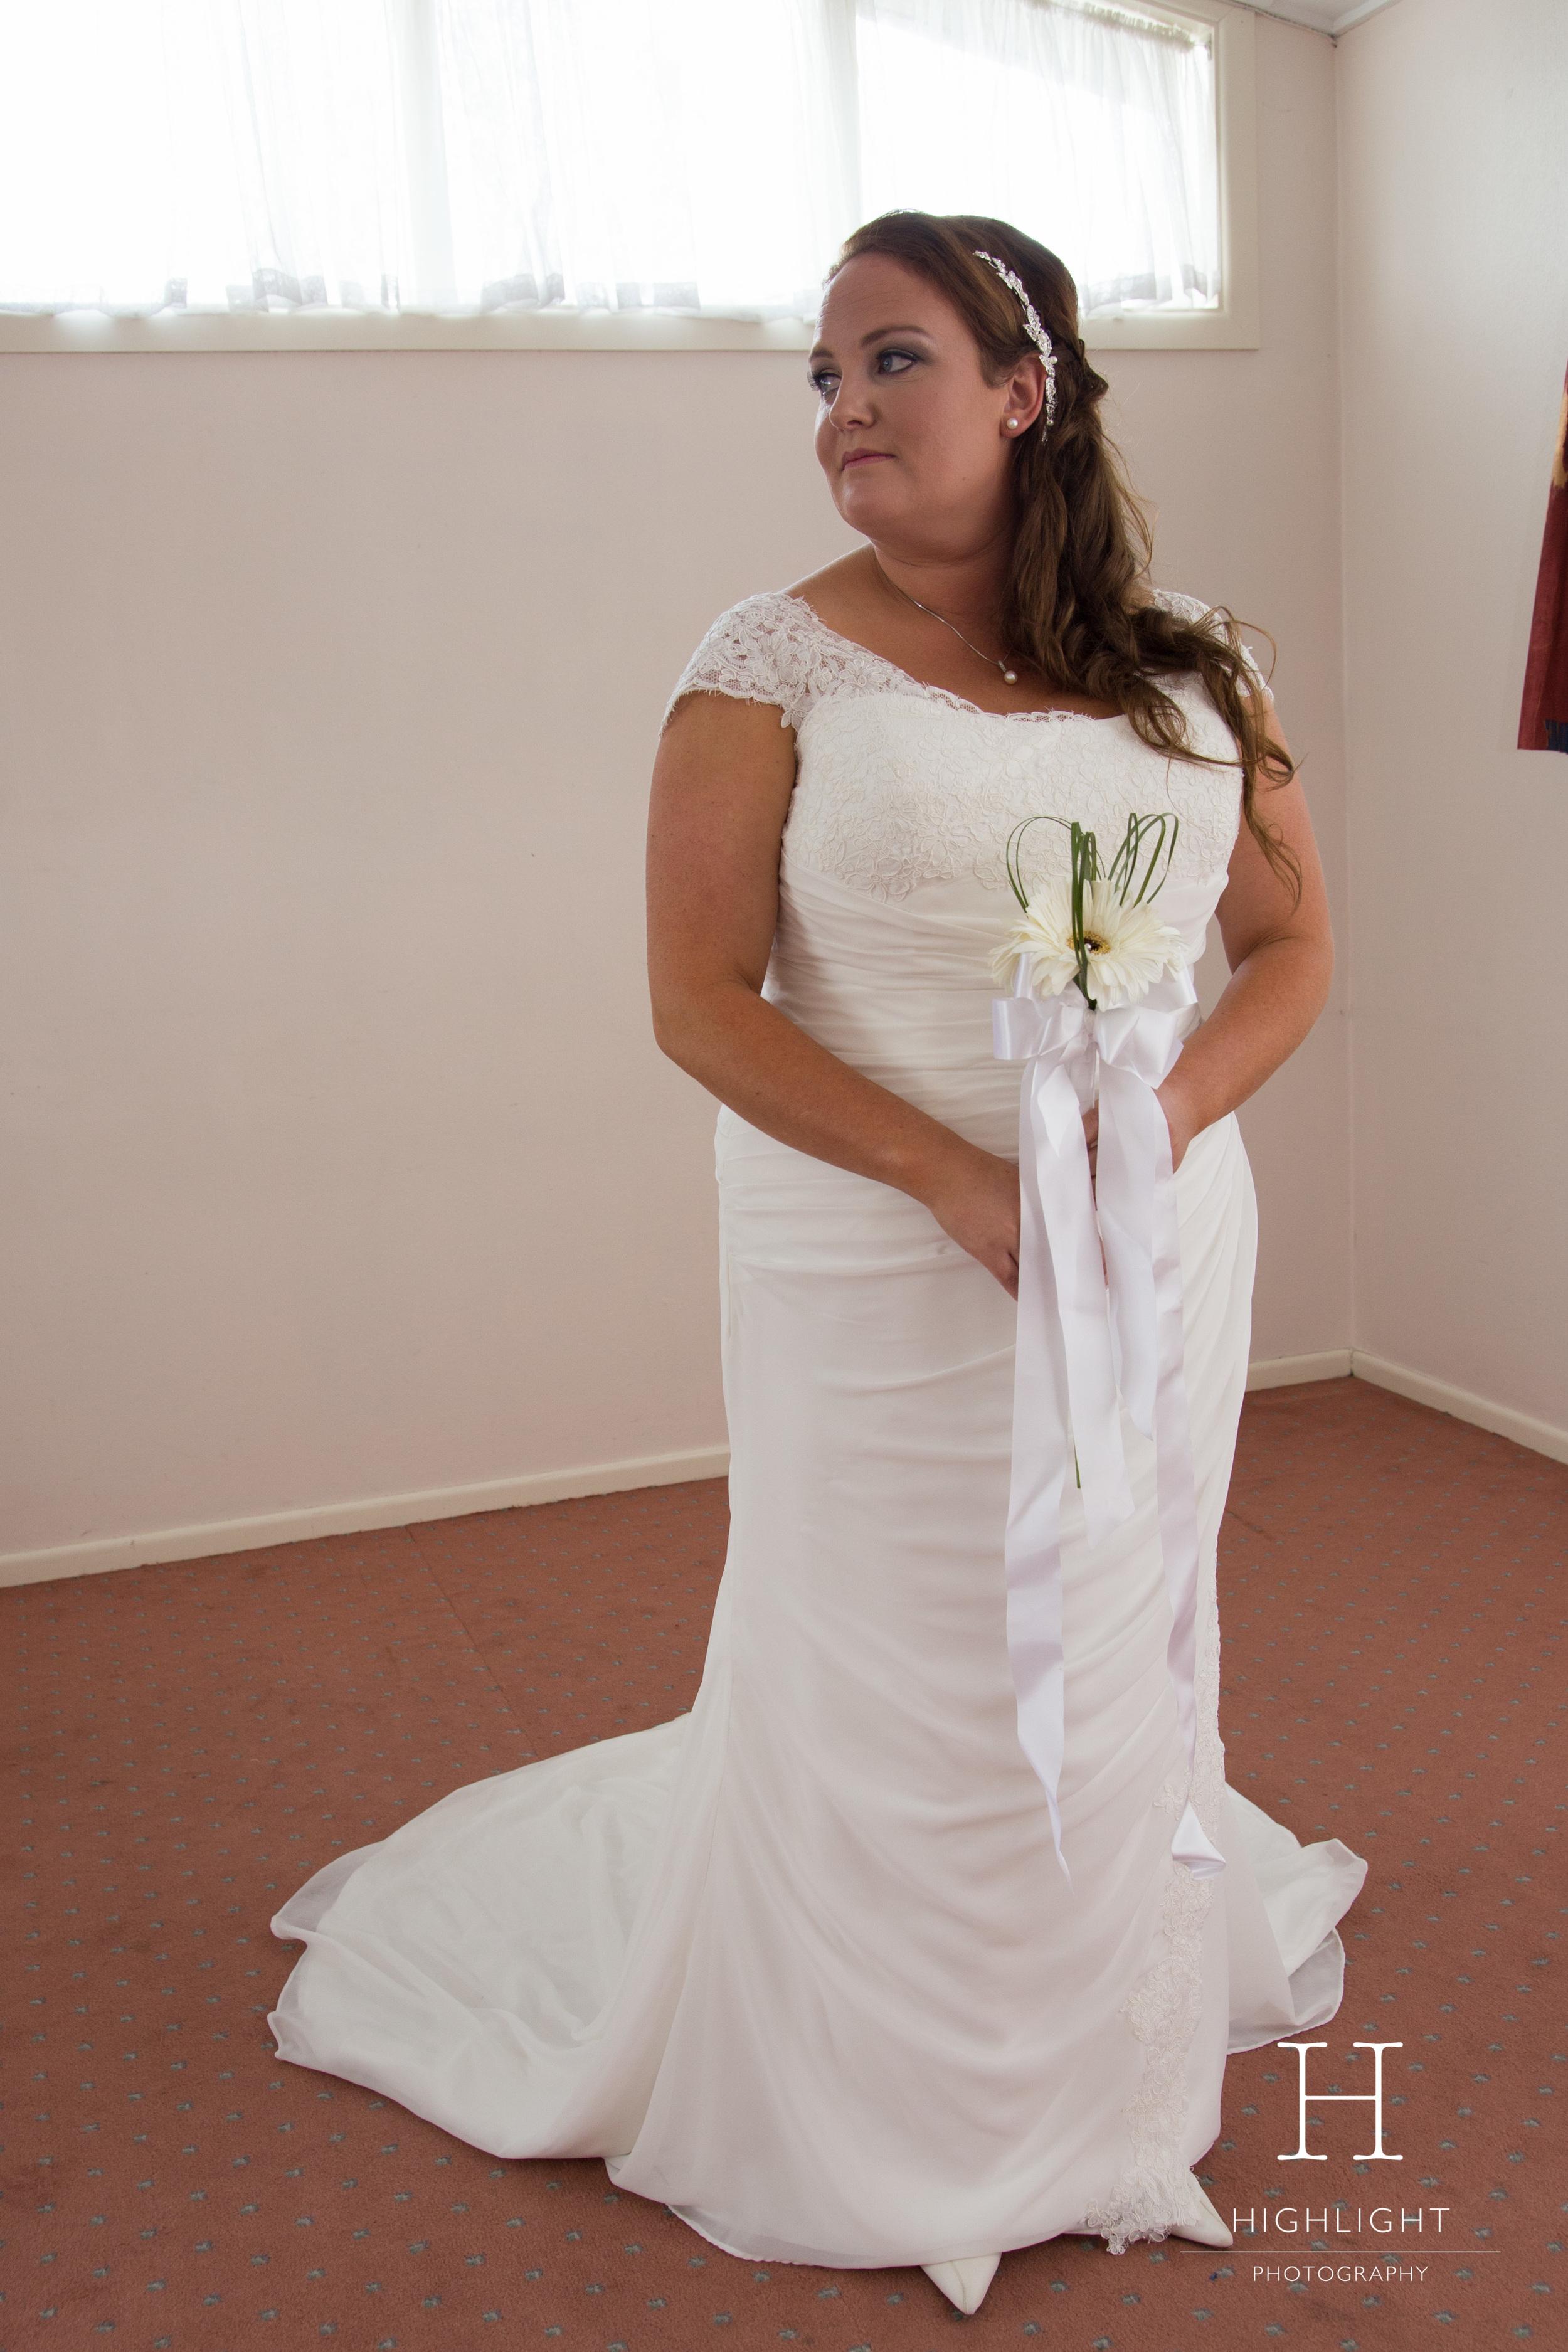 highlight_photography_wedding_new_zealand_bride_mother.jpg